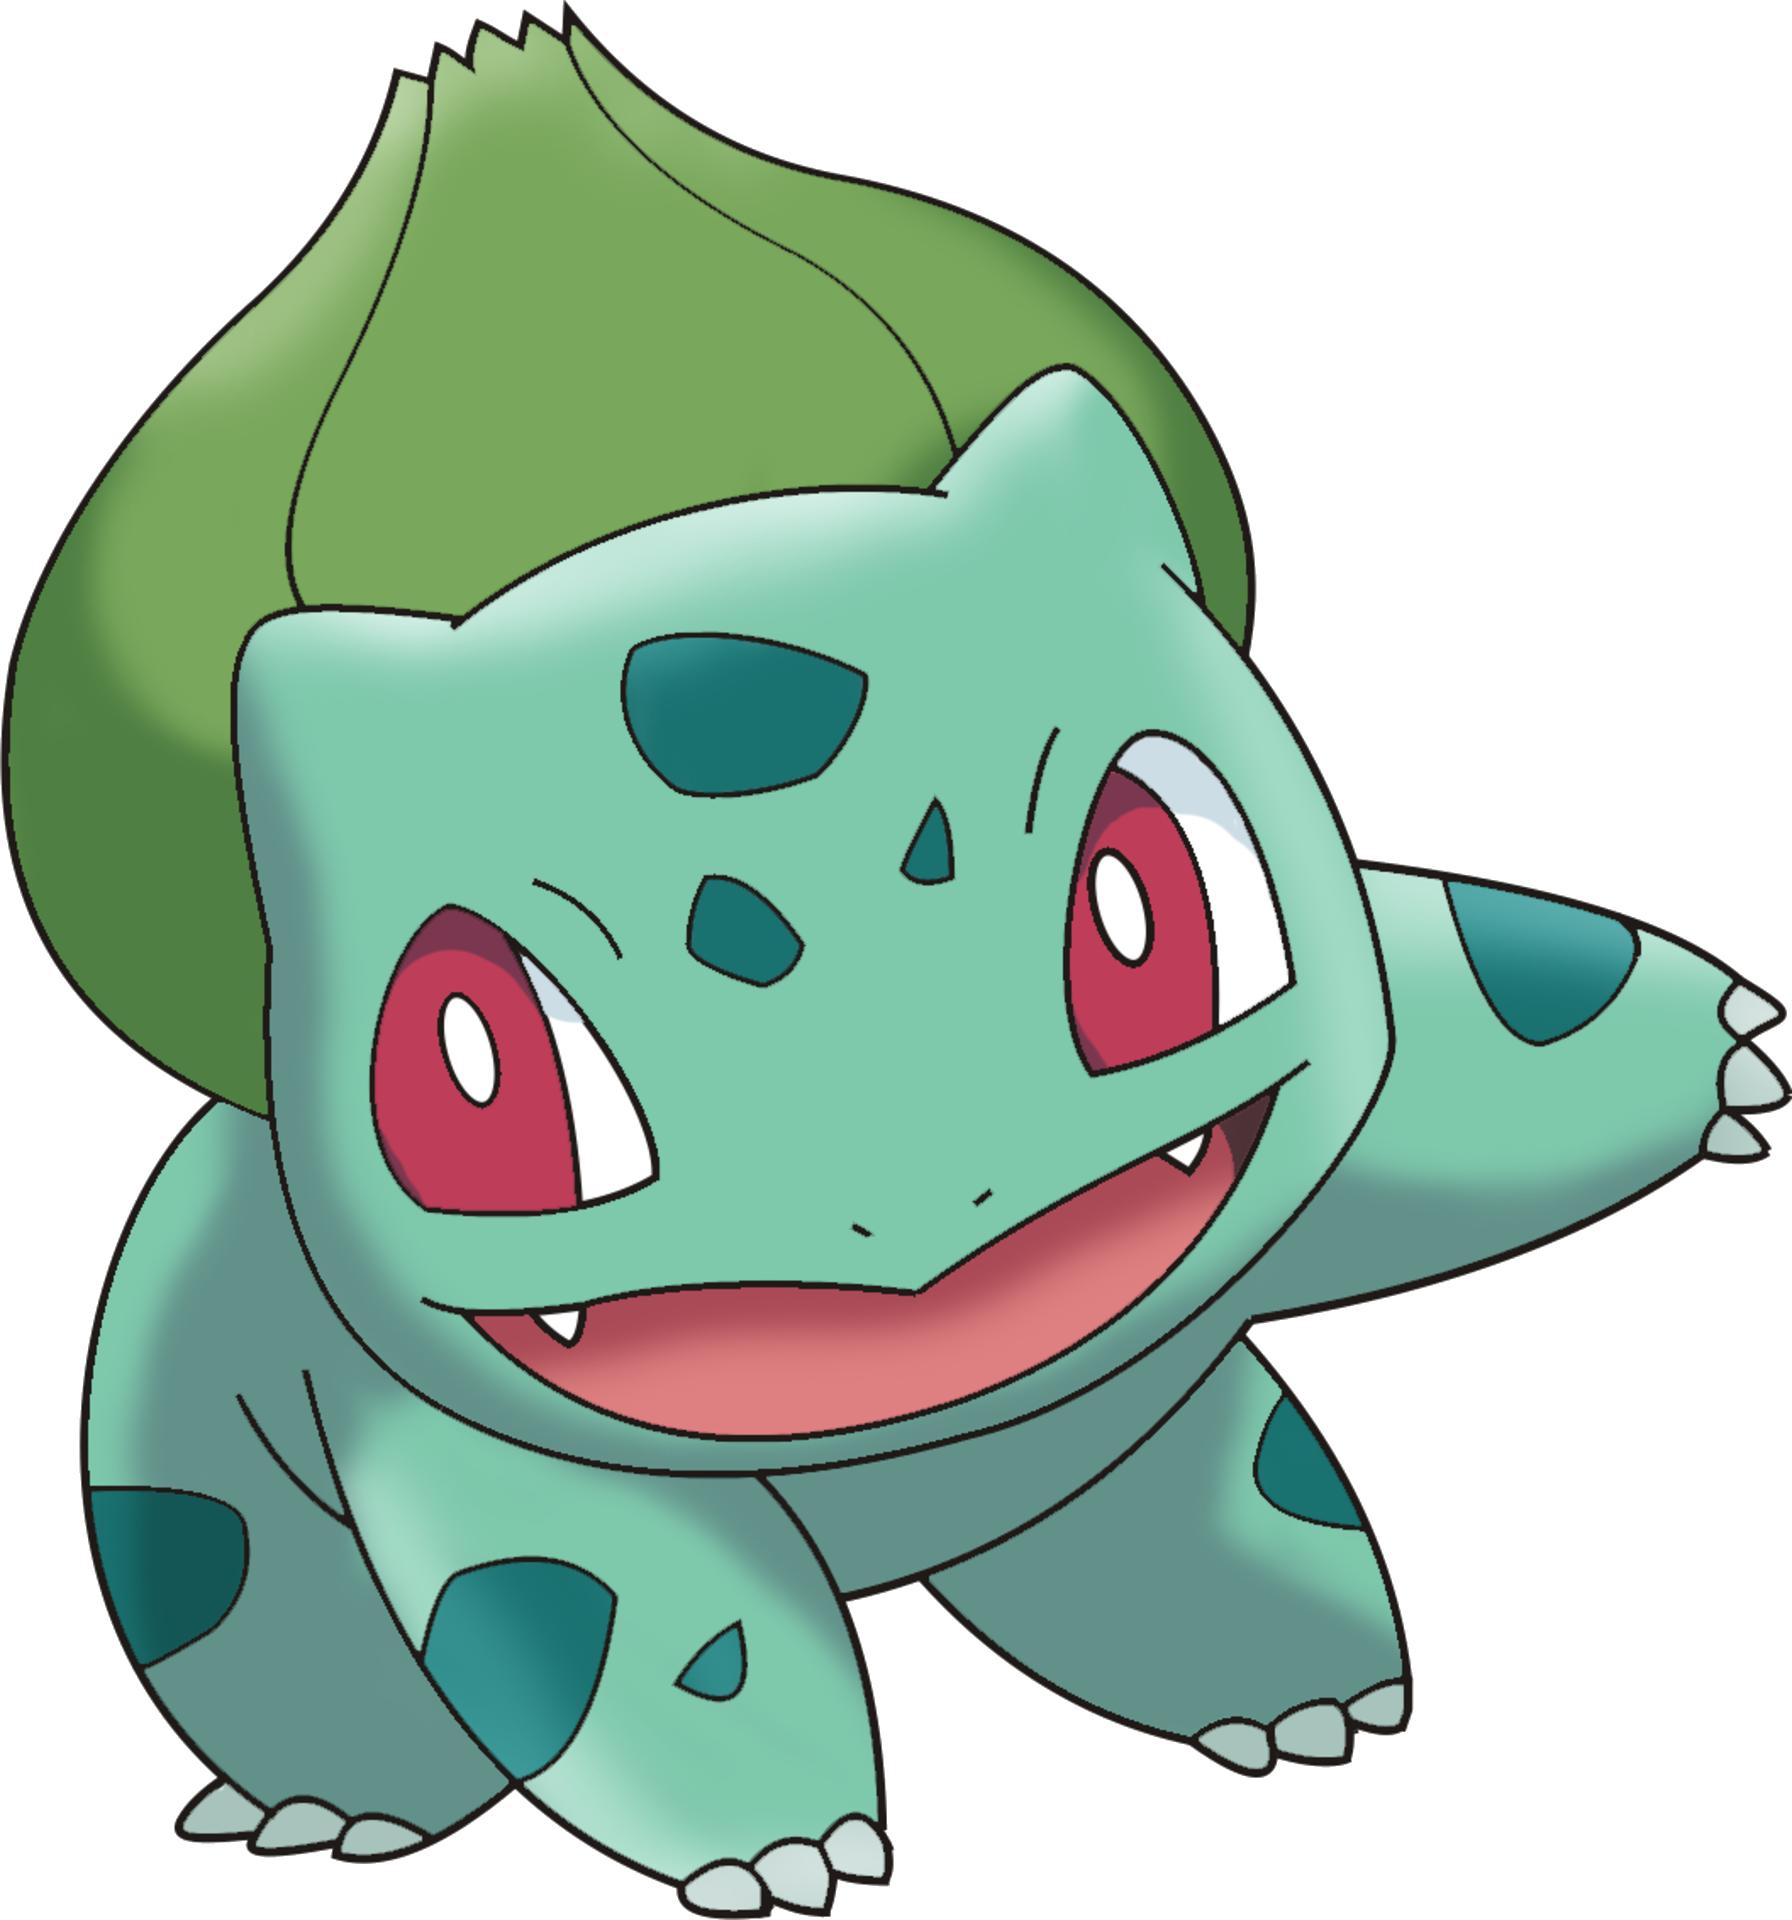 Image purepng free transparent. Pokemon png images